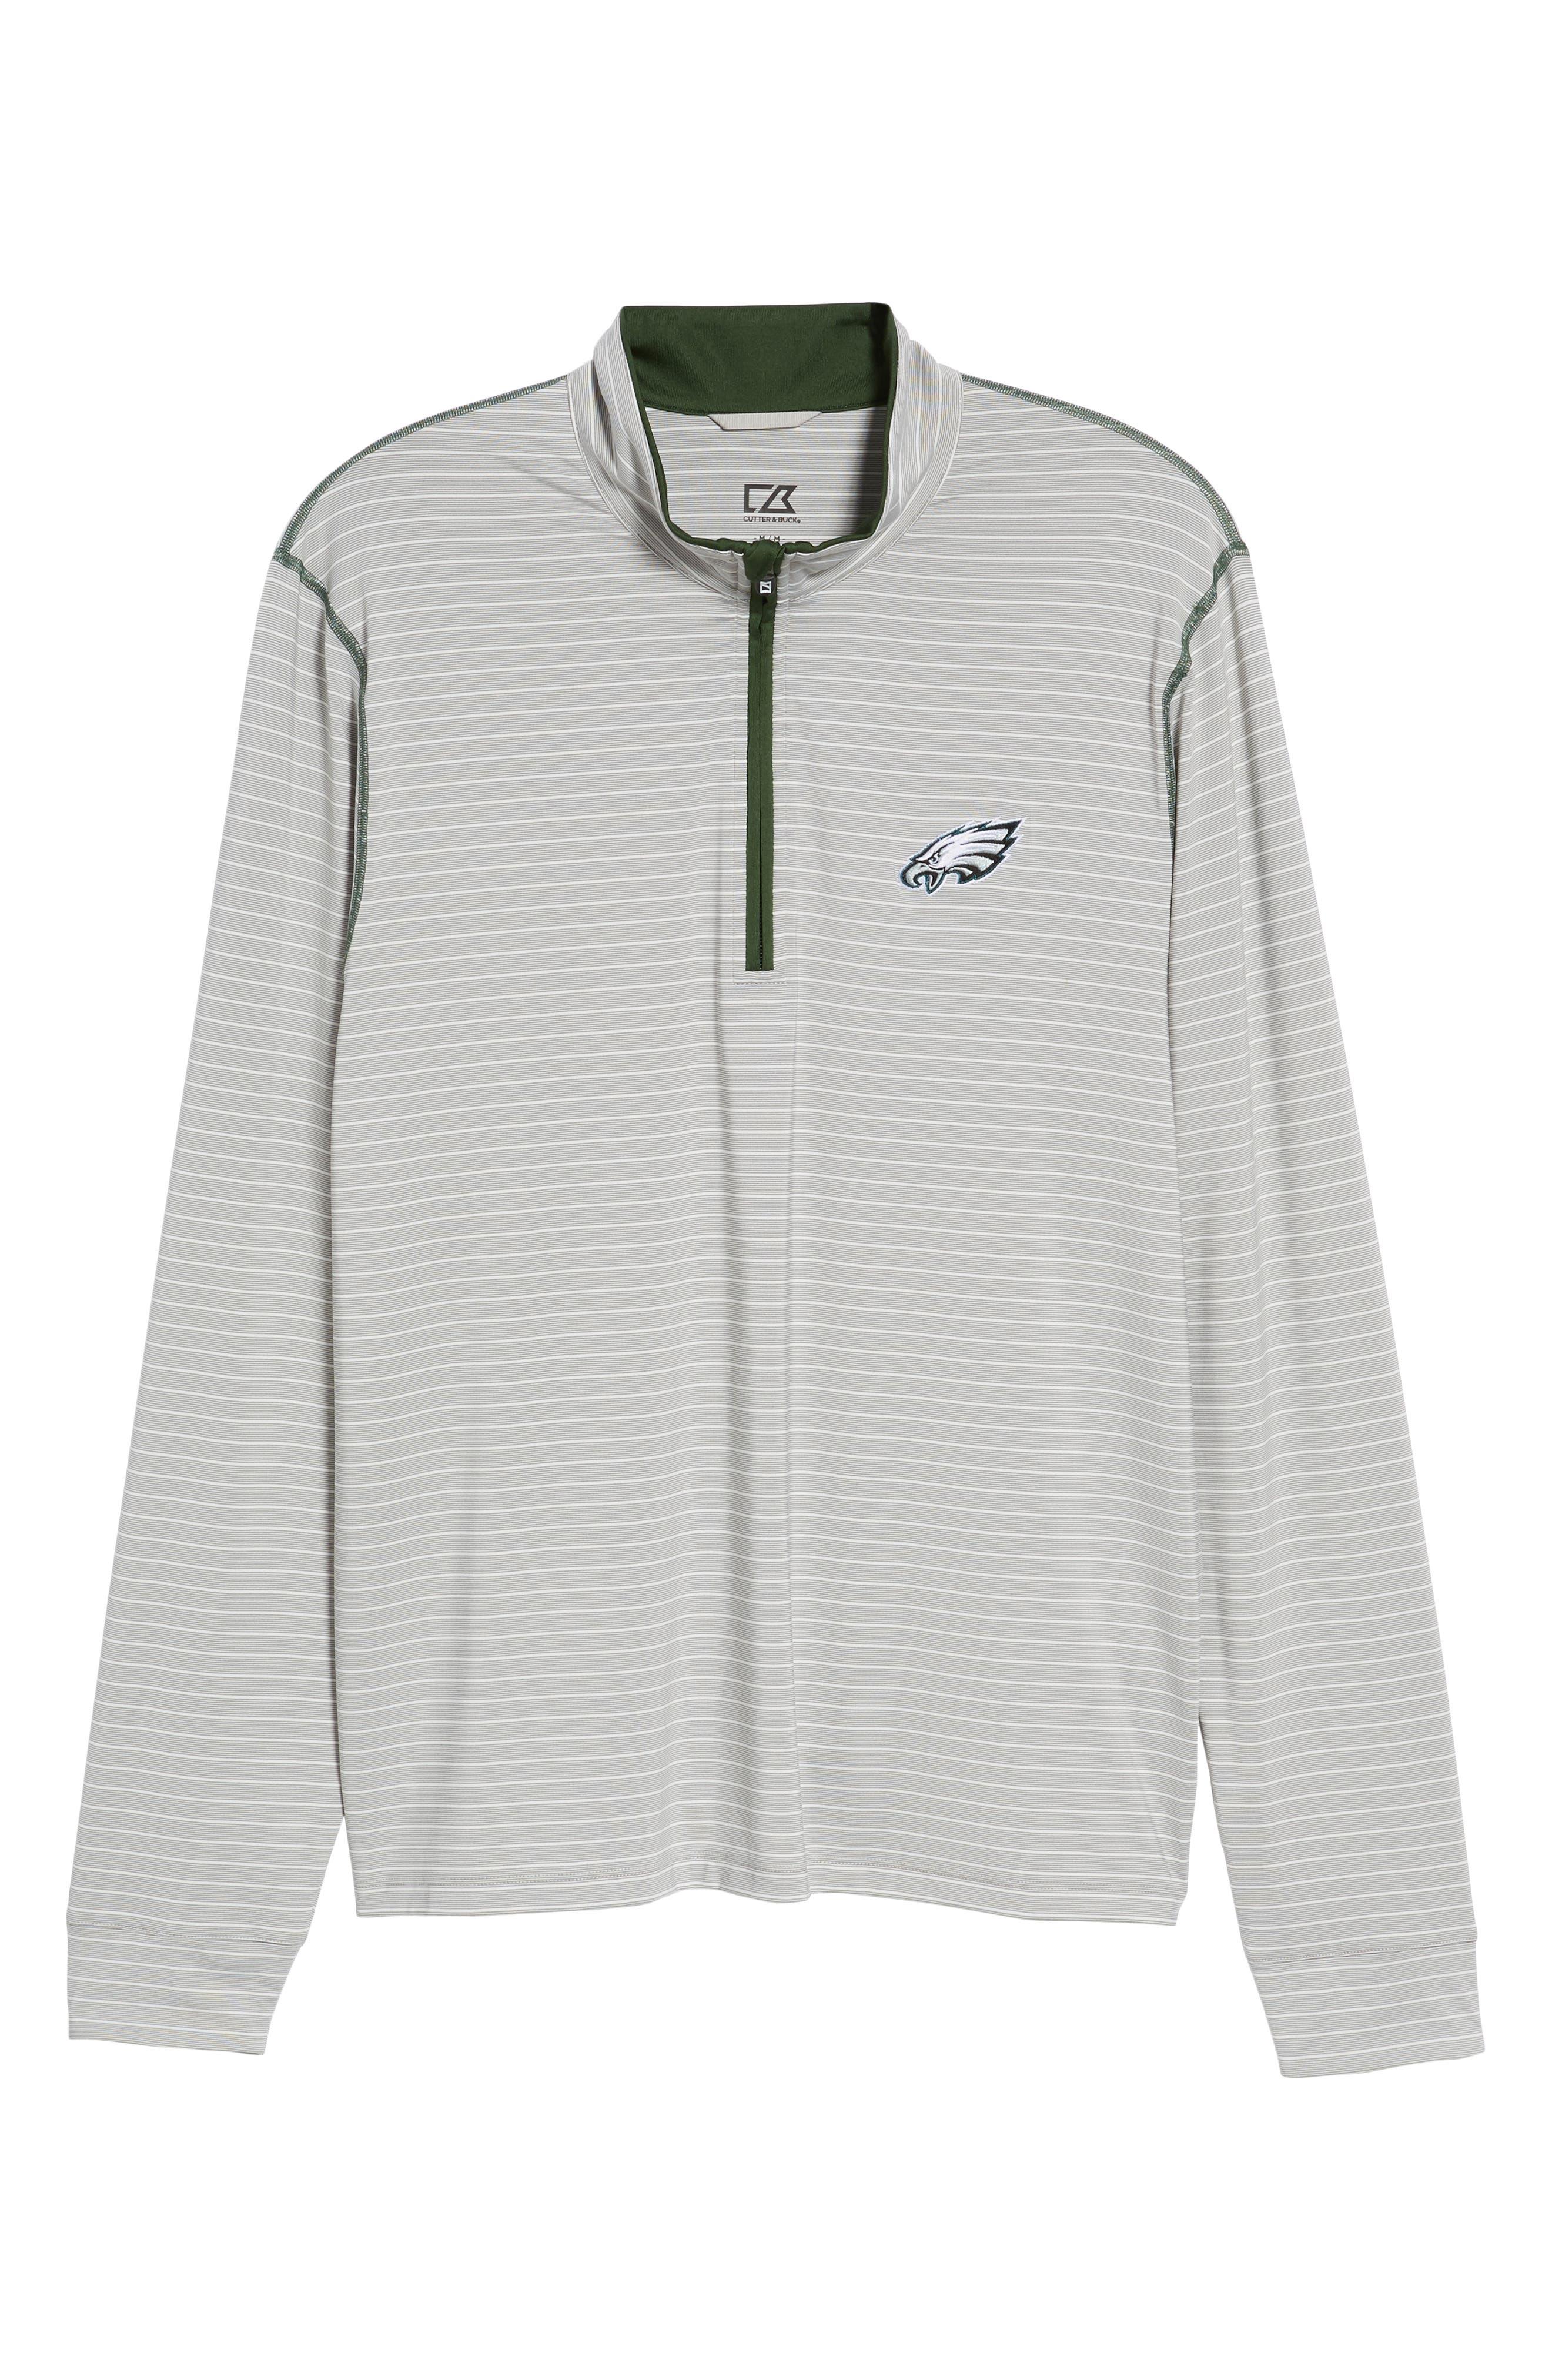 Meridian - Philadelphia Eagles Regular Fit Half Zip Pullover,                             Alternate thumbnail 6, color,                             377